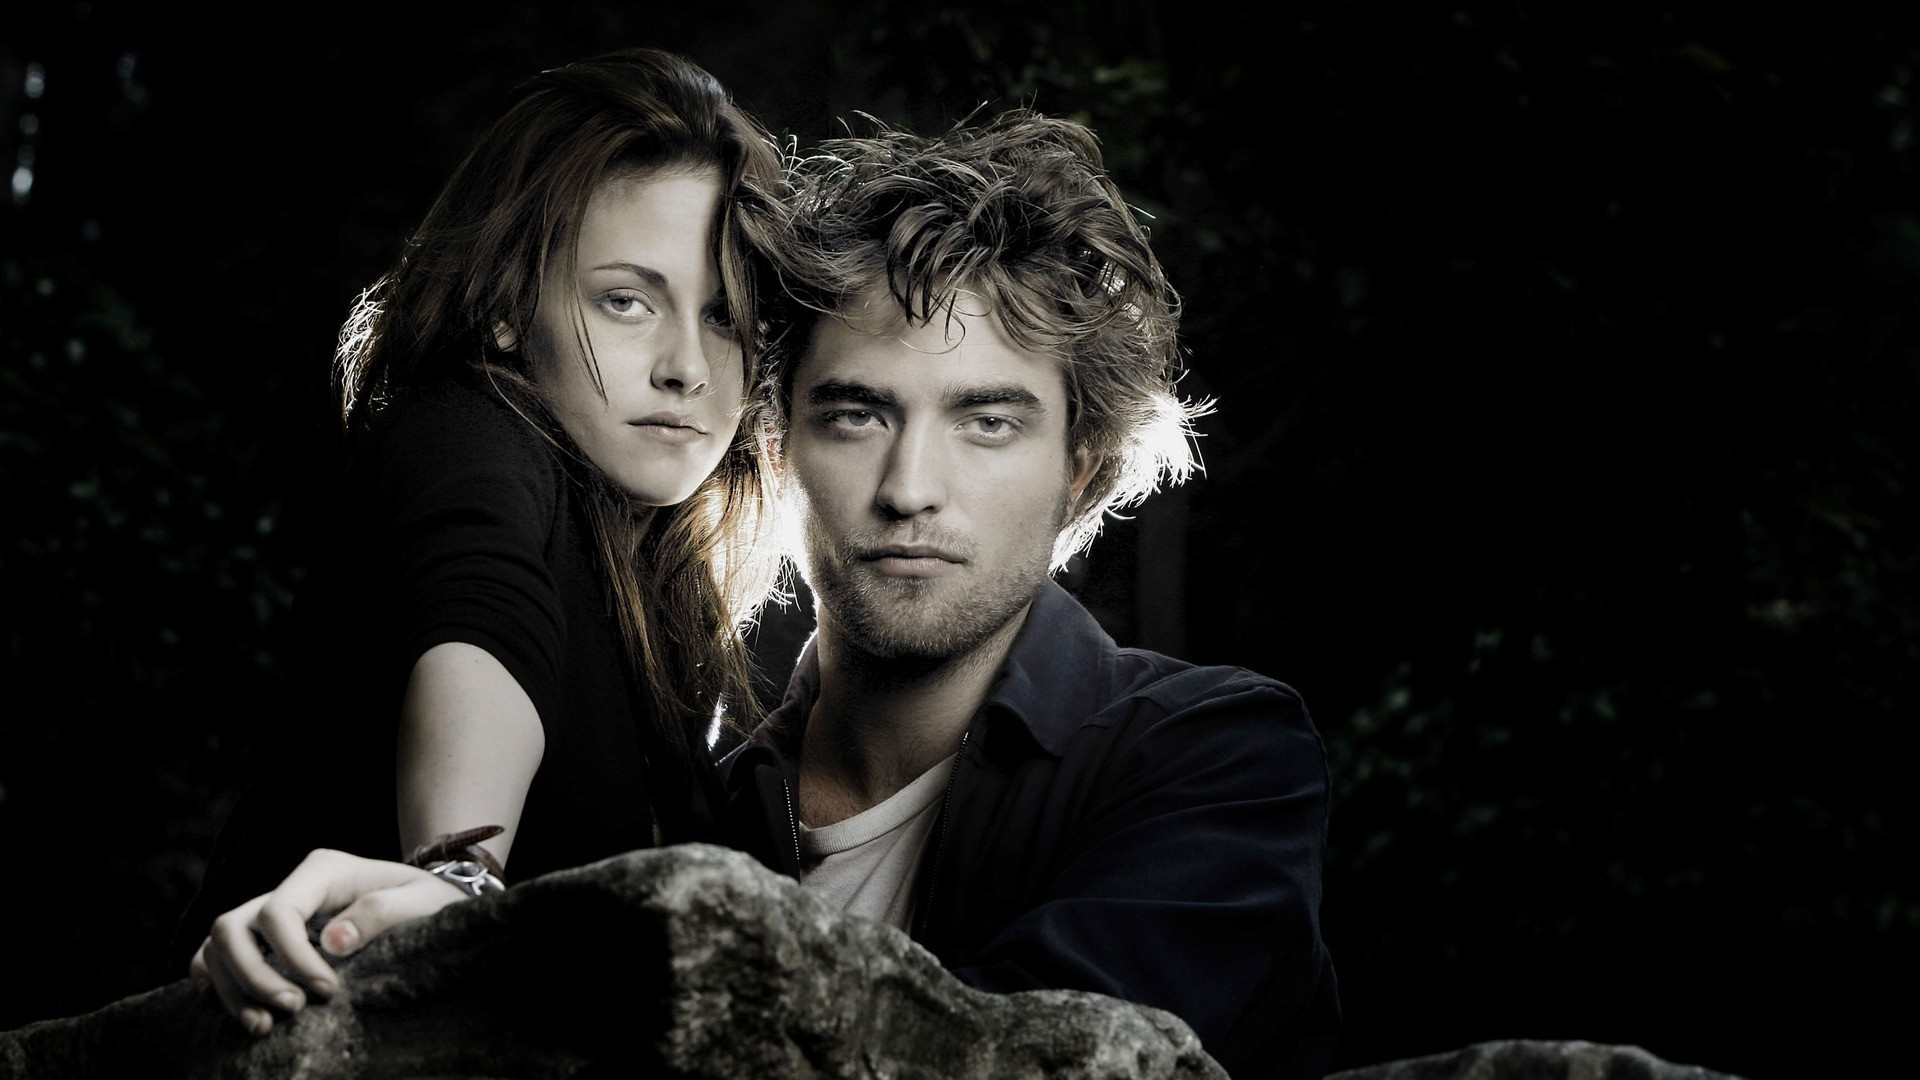 Twilight Breaking Dawn Part 2 Wallpaper Hd Robert Pattinson Twilight Wallpaper 183 ① Wallpapertag